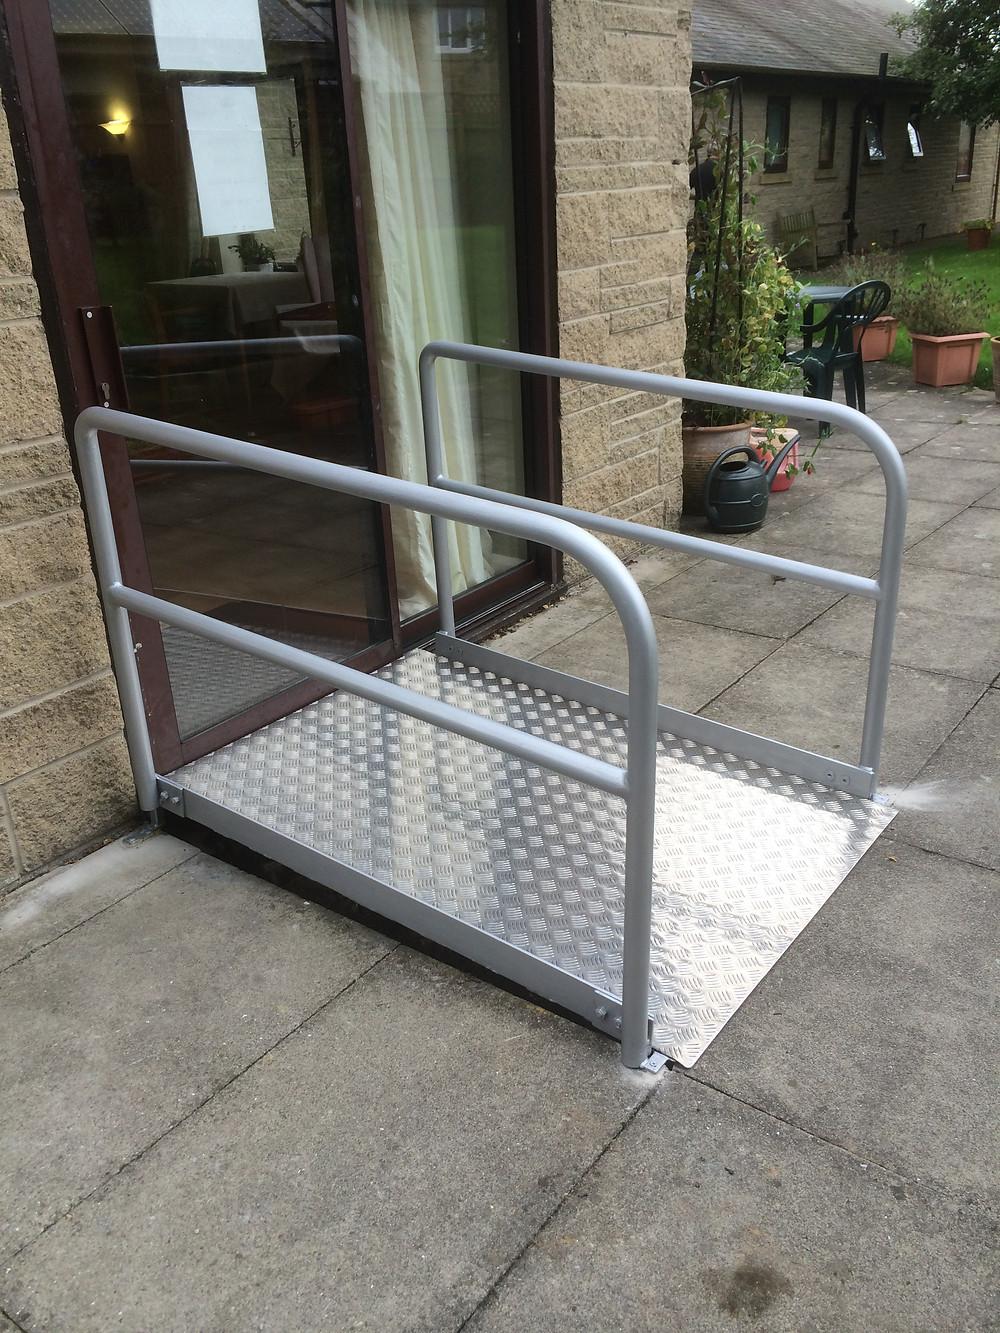 Wheel chair ramp with handrails